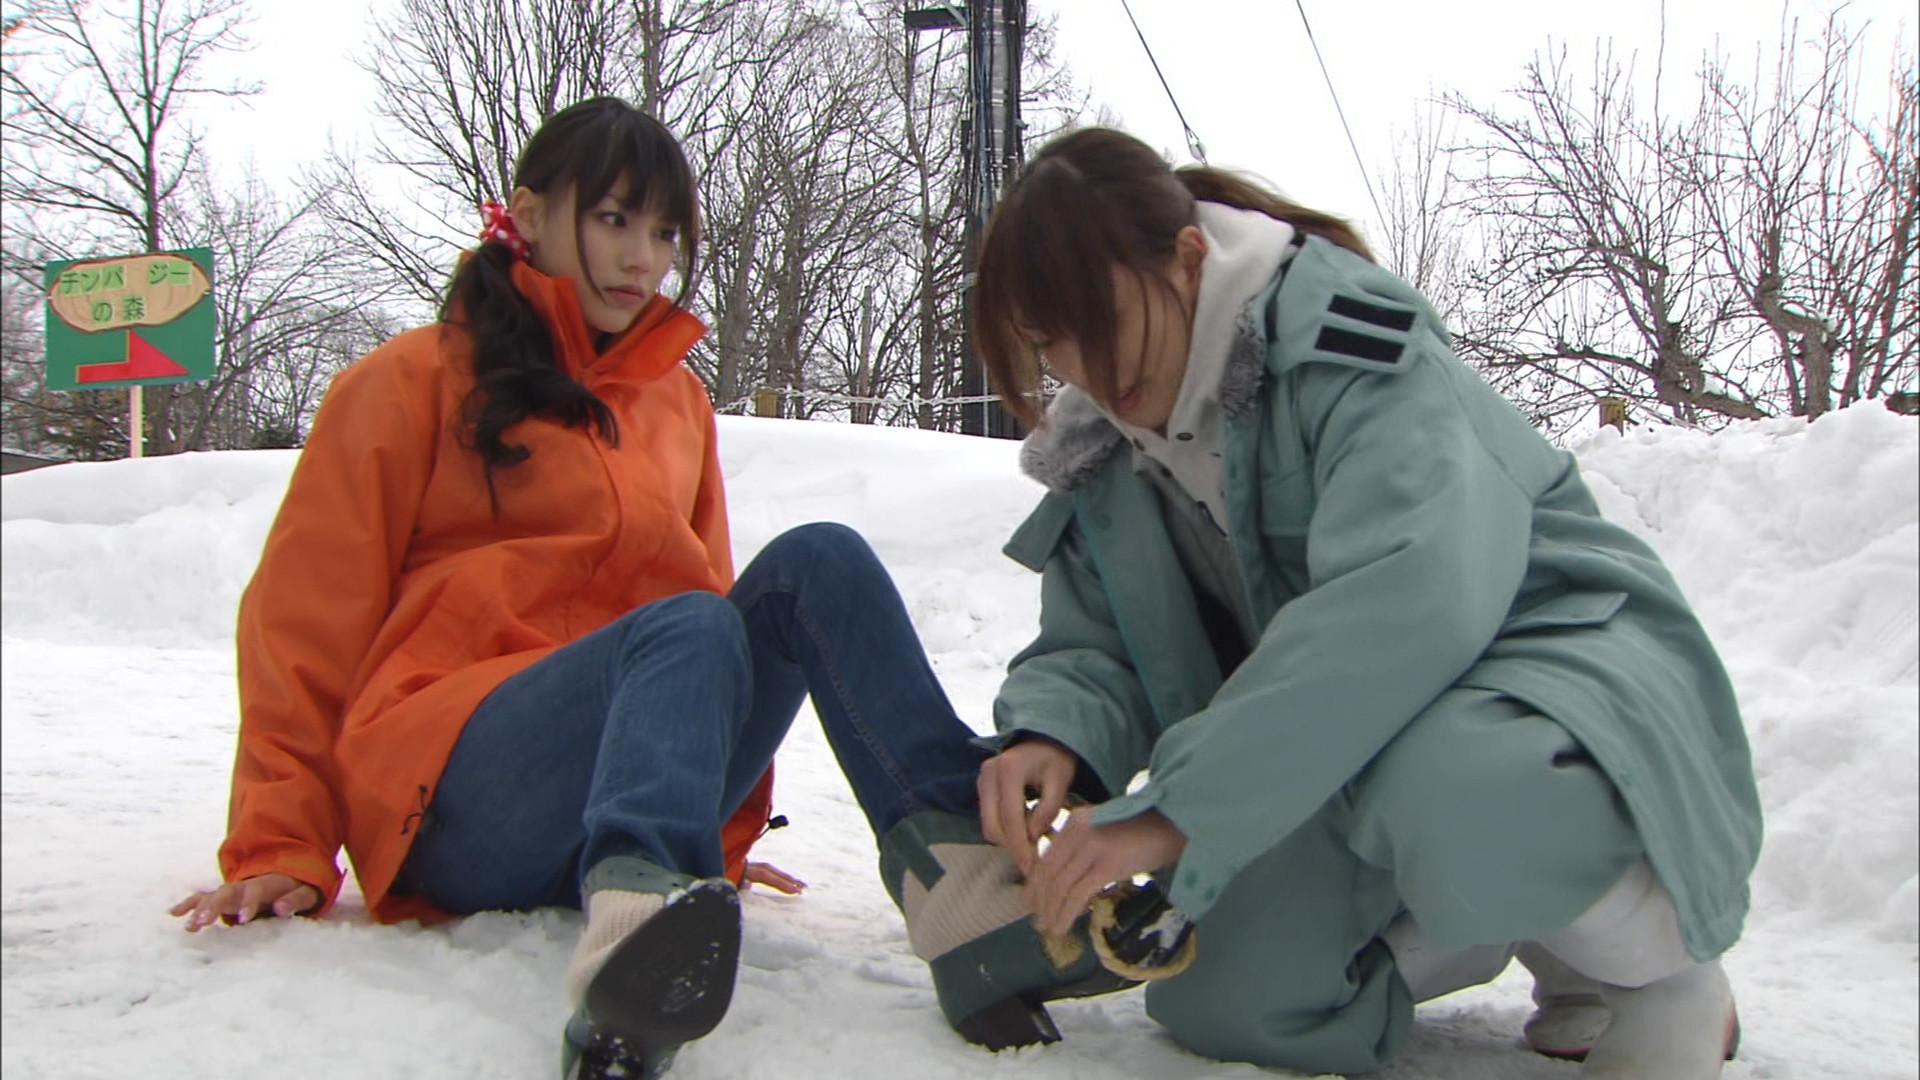 玩具箱 「奇跡の動物園2010 旭山...